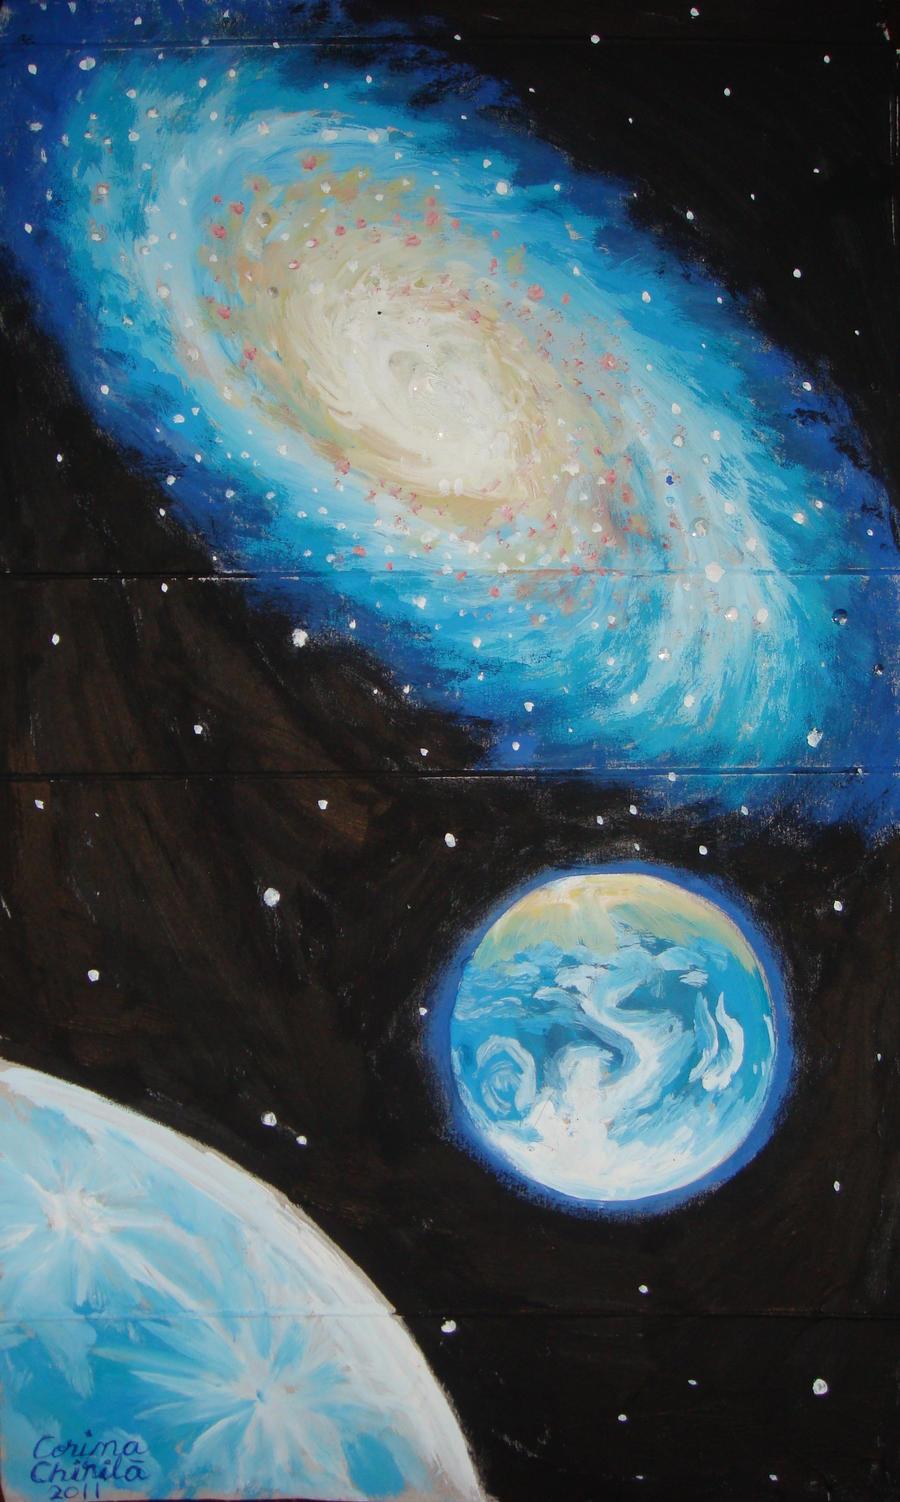 galaxy planet earth - photo #27